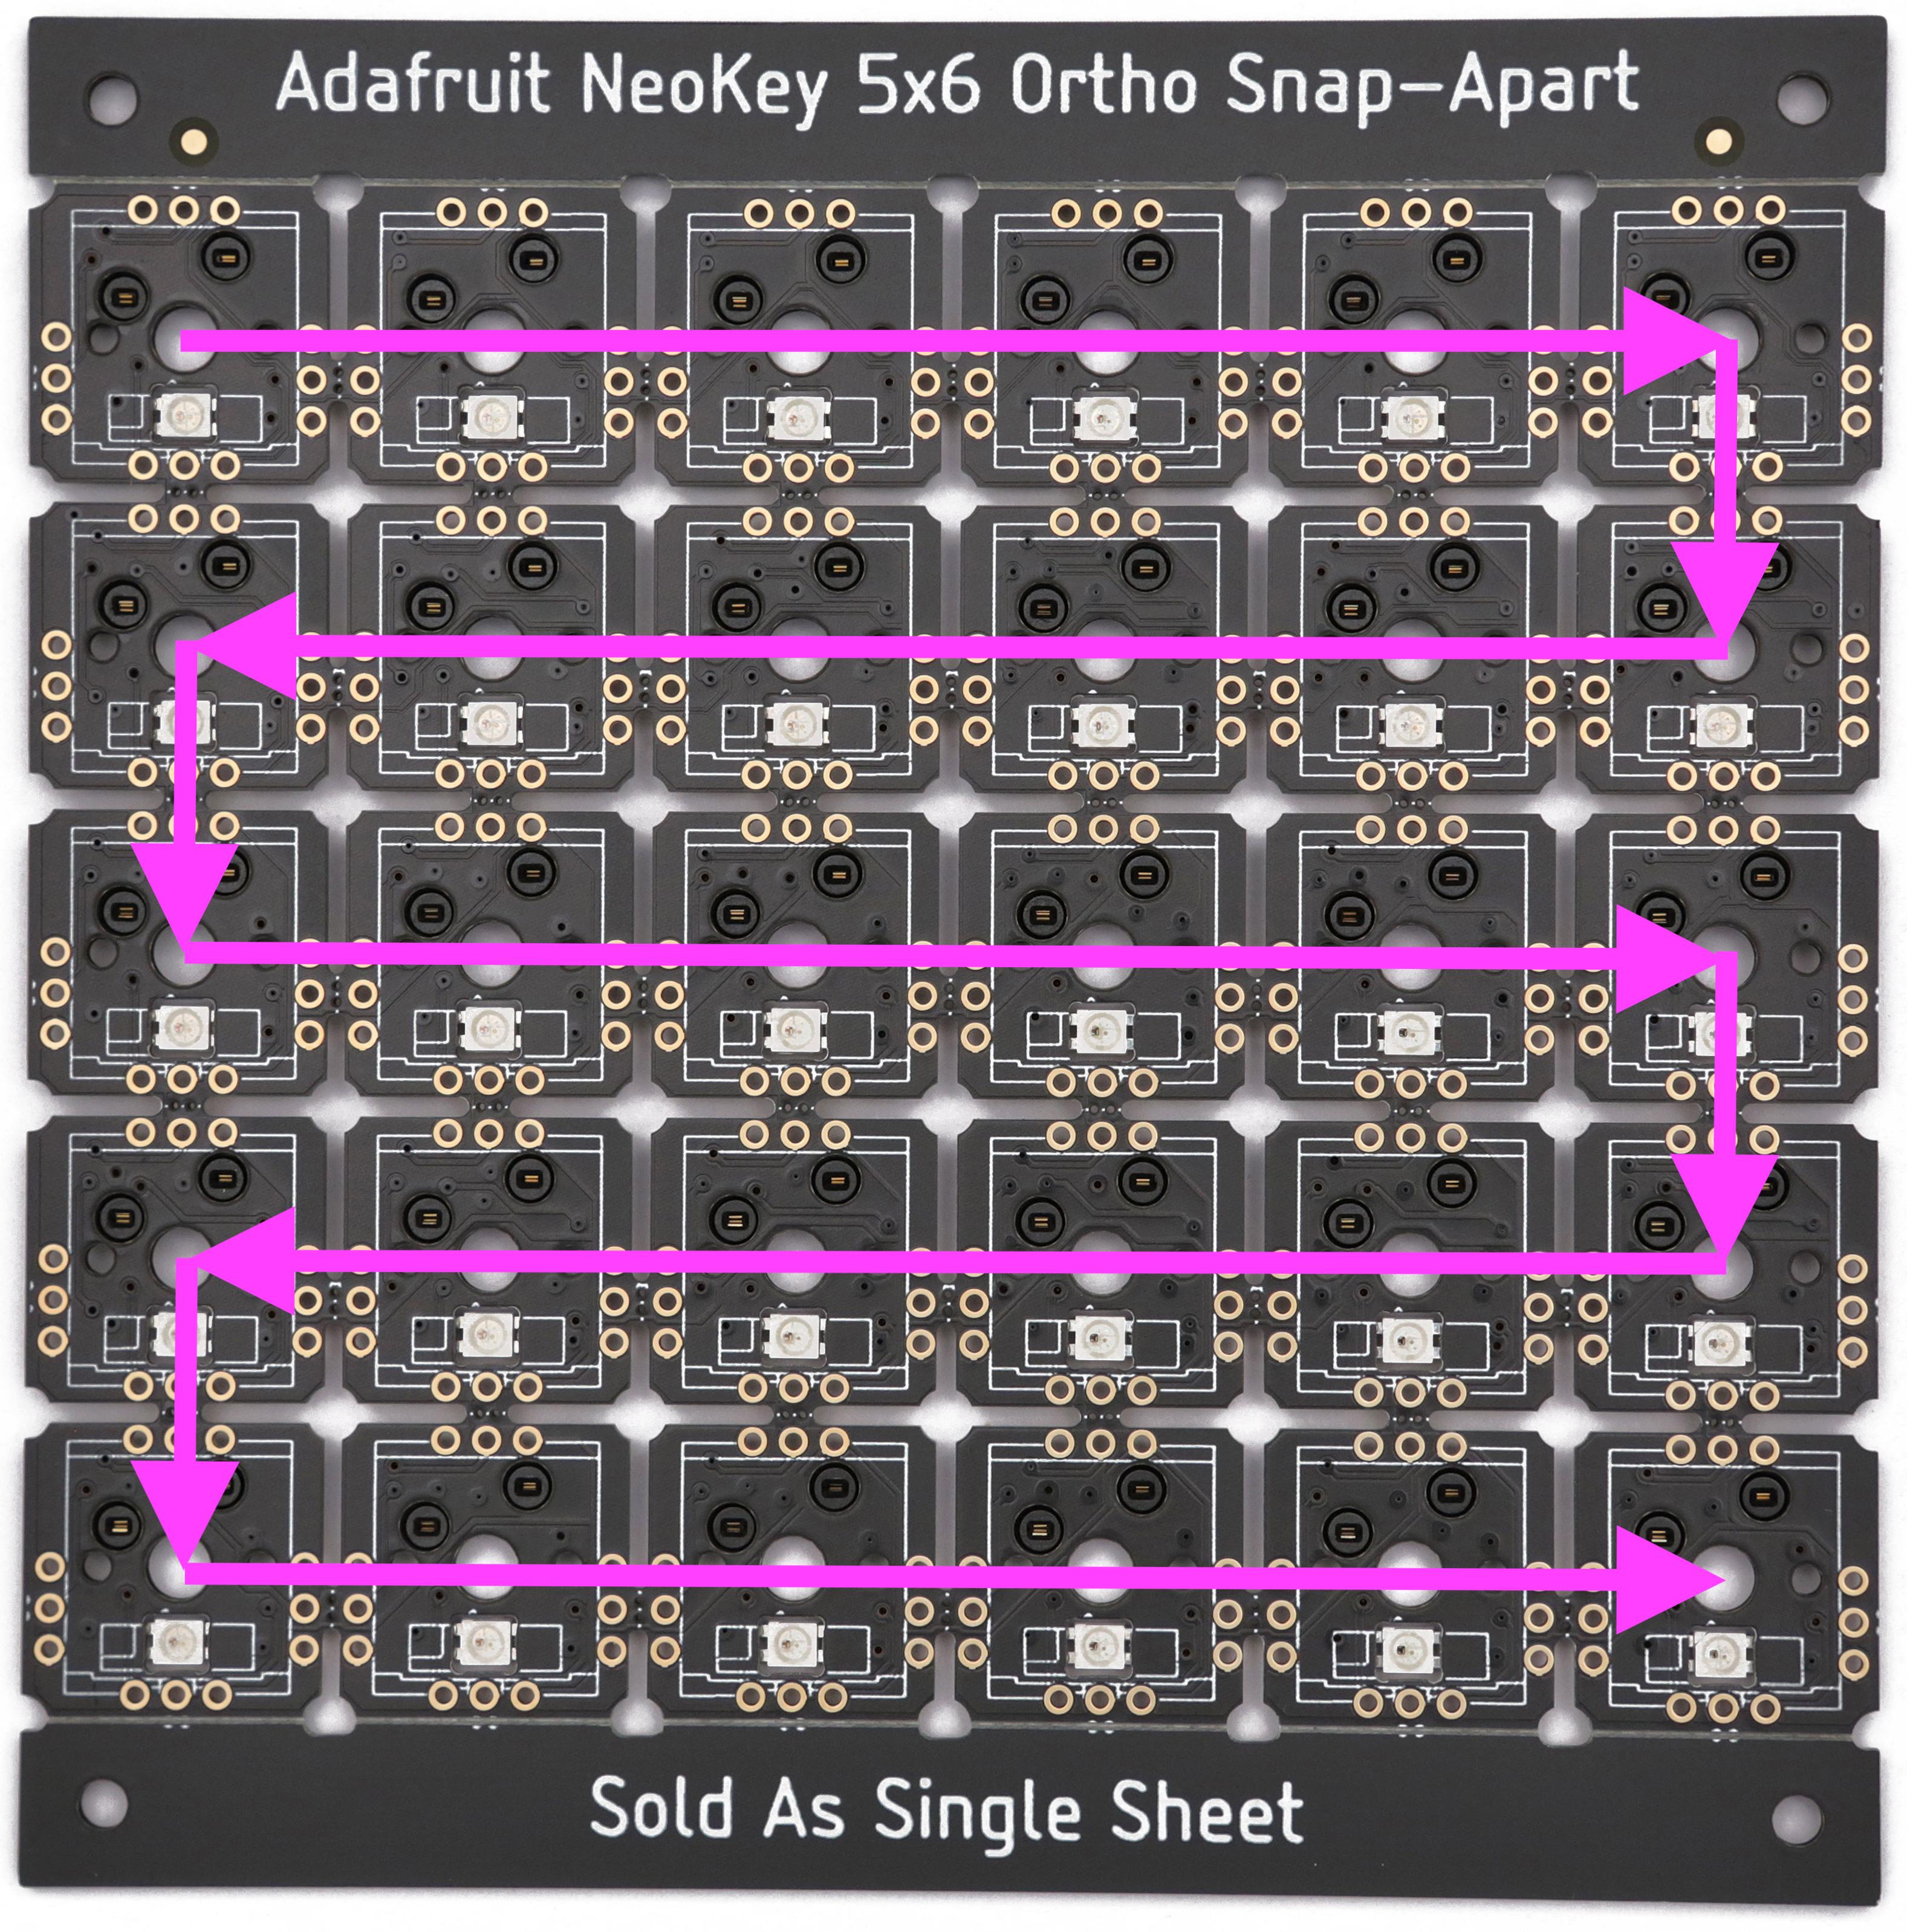 adafruit_products_NKOSA_NeoPixel_order.jpg